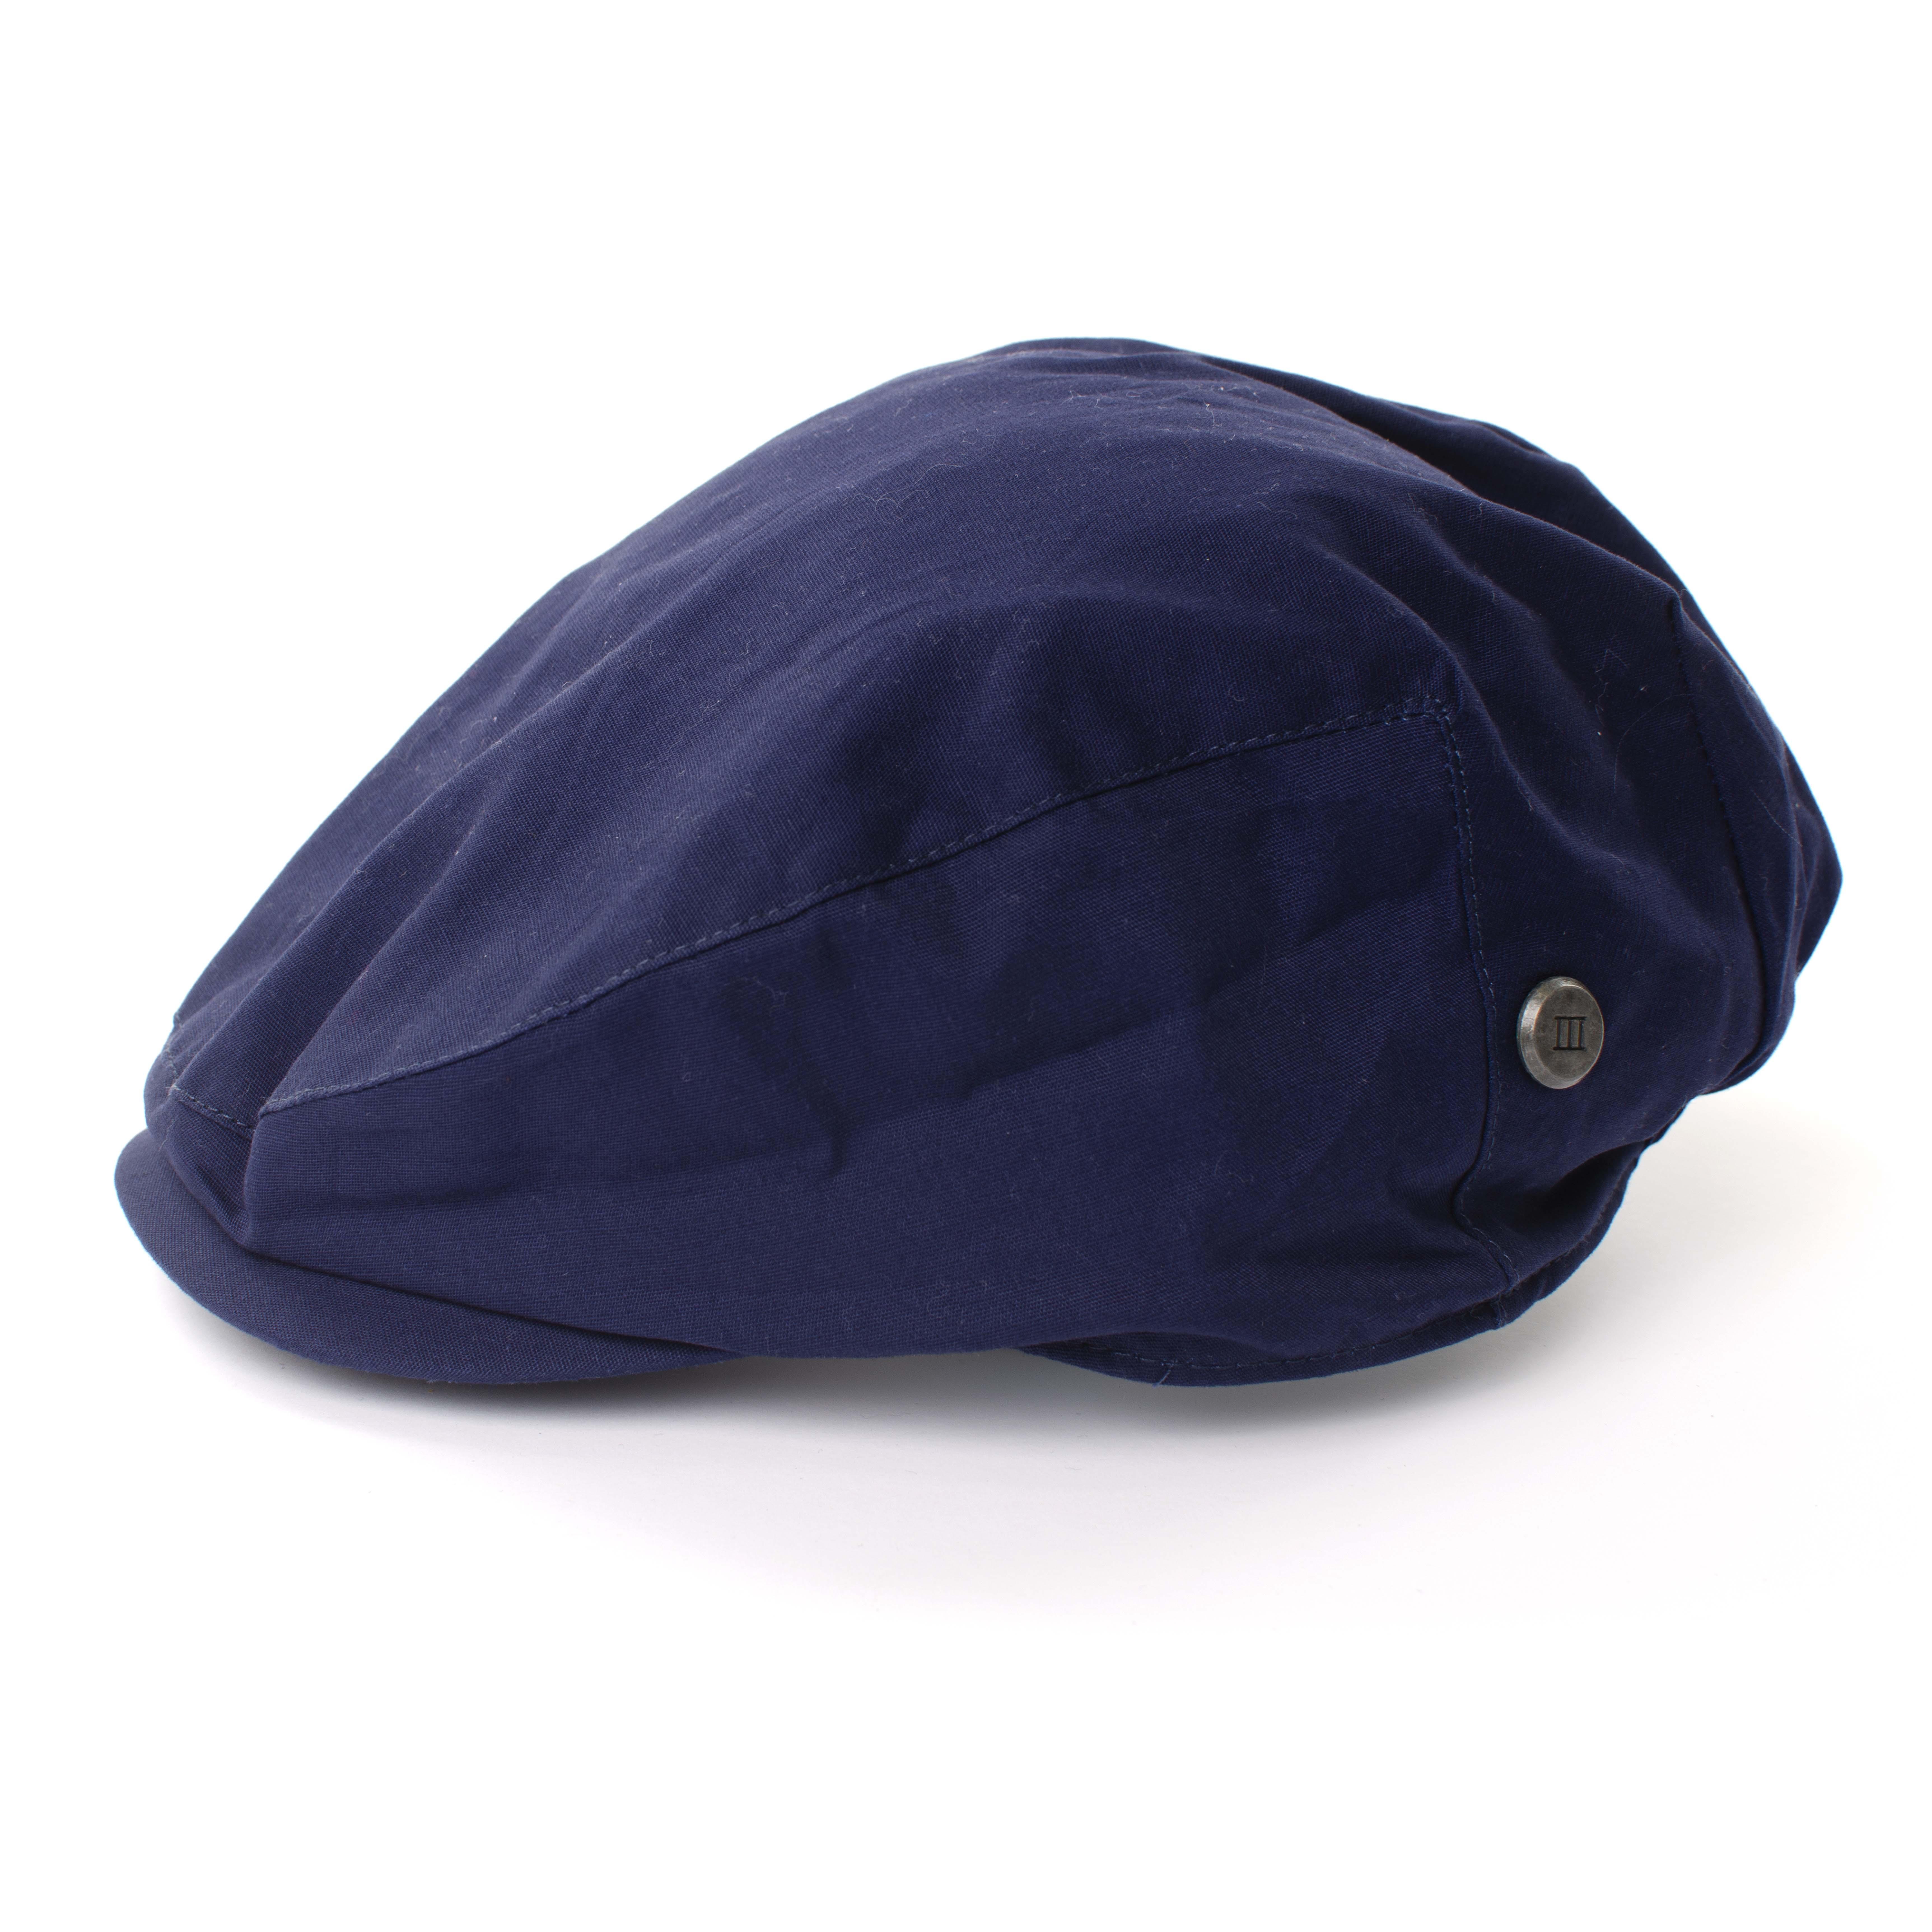 Teddie | Flat cap navy blue